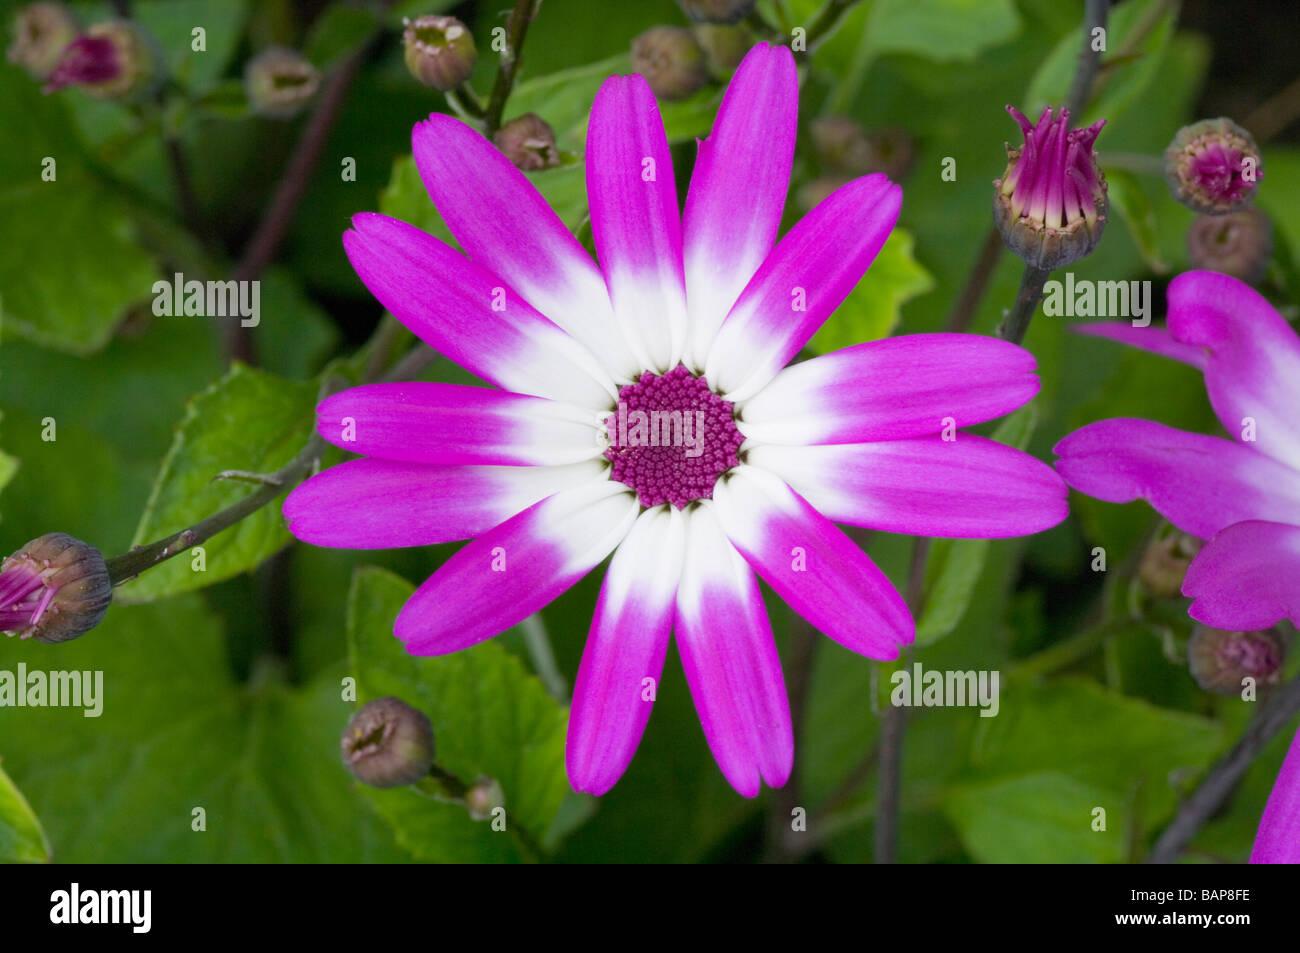 Sunsenereba Magenta Bicolor cineraria - Stock Image